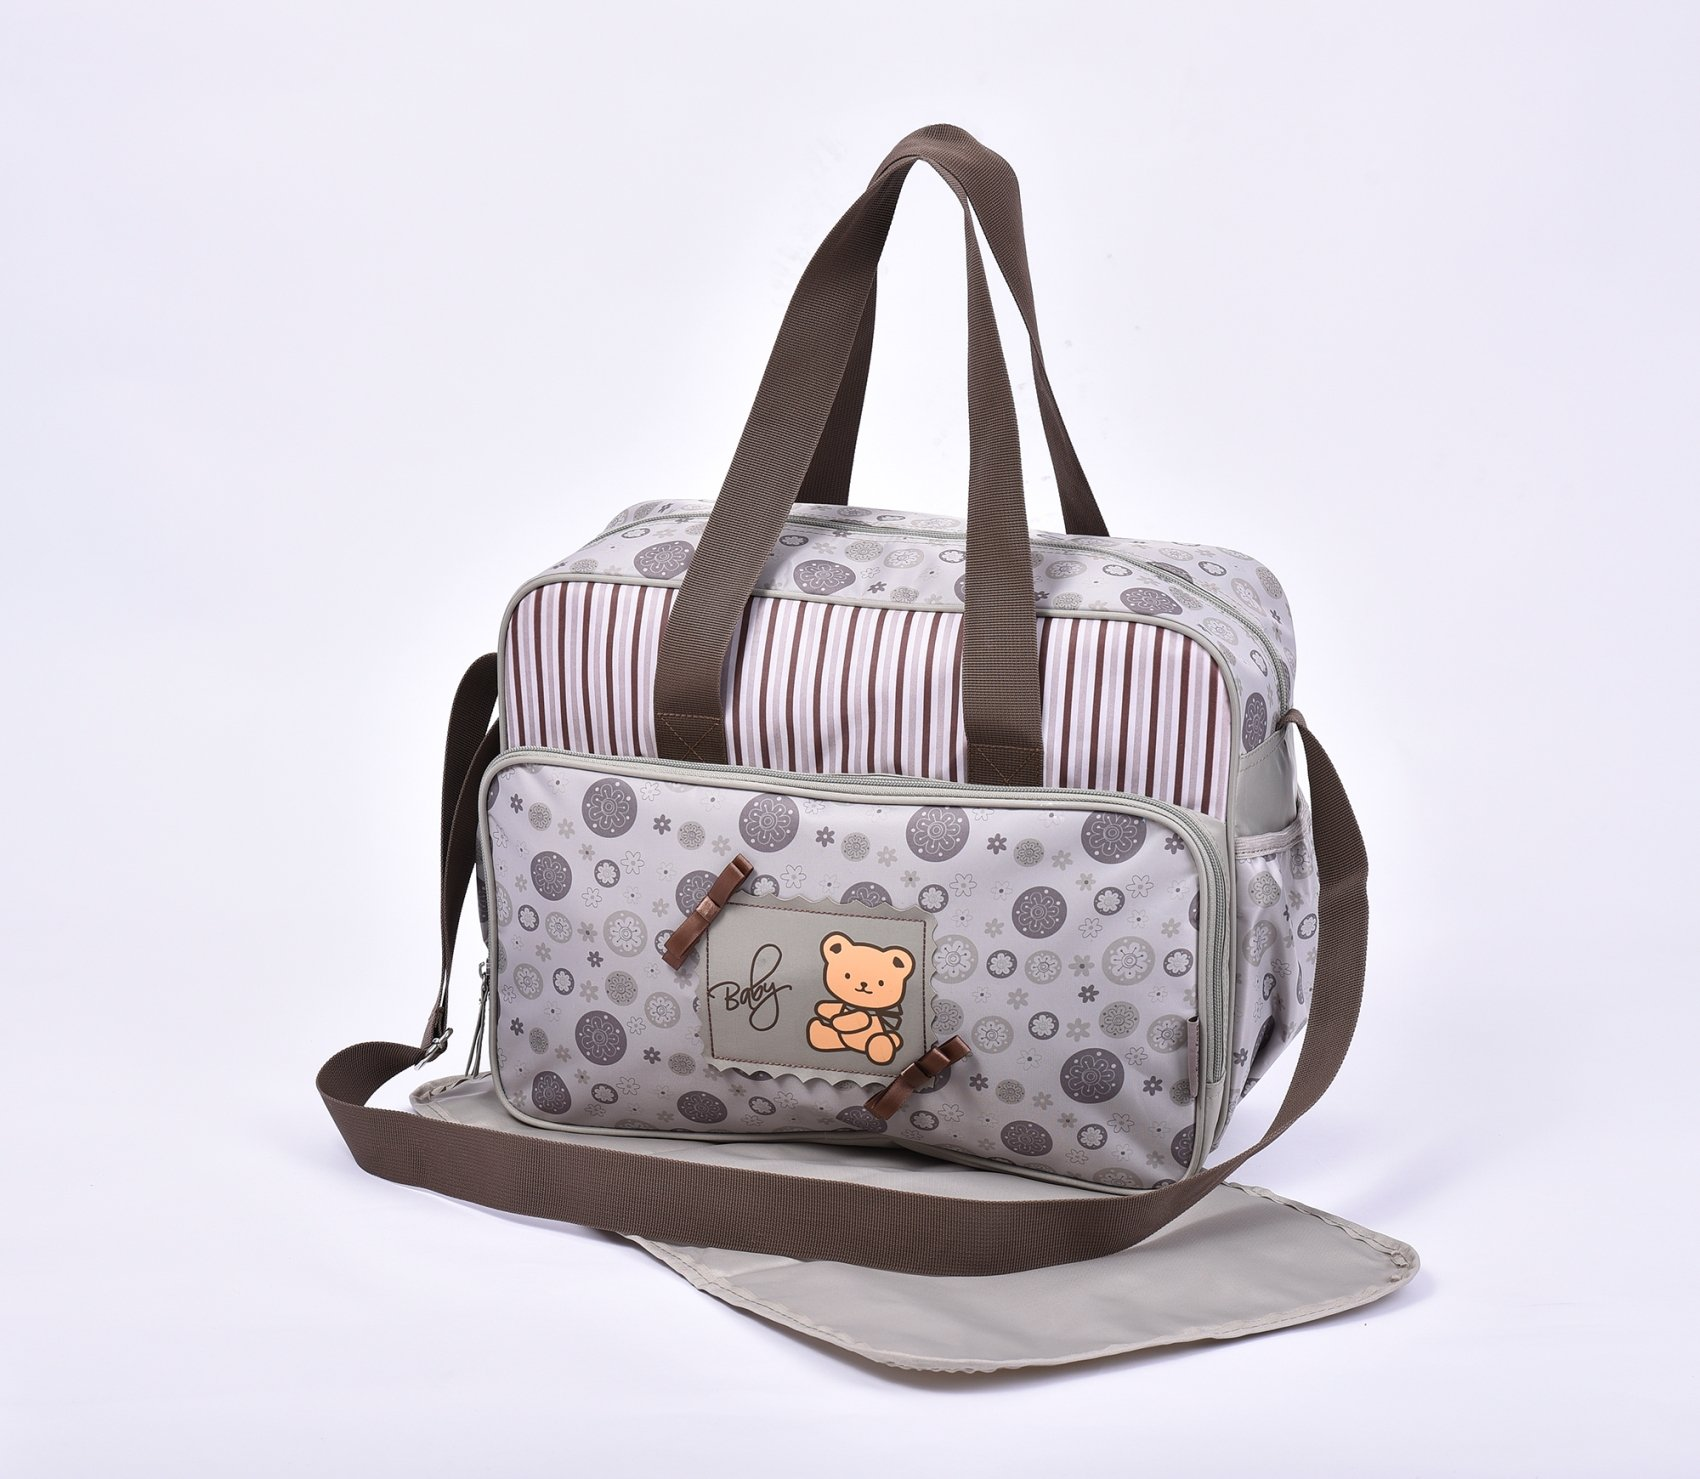 2160 Water Proof Waterproof Large Baby Nappy Changing Bags Diaper Hospital Bag (2160-Beige Bear)